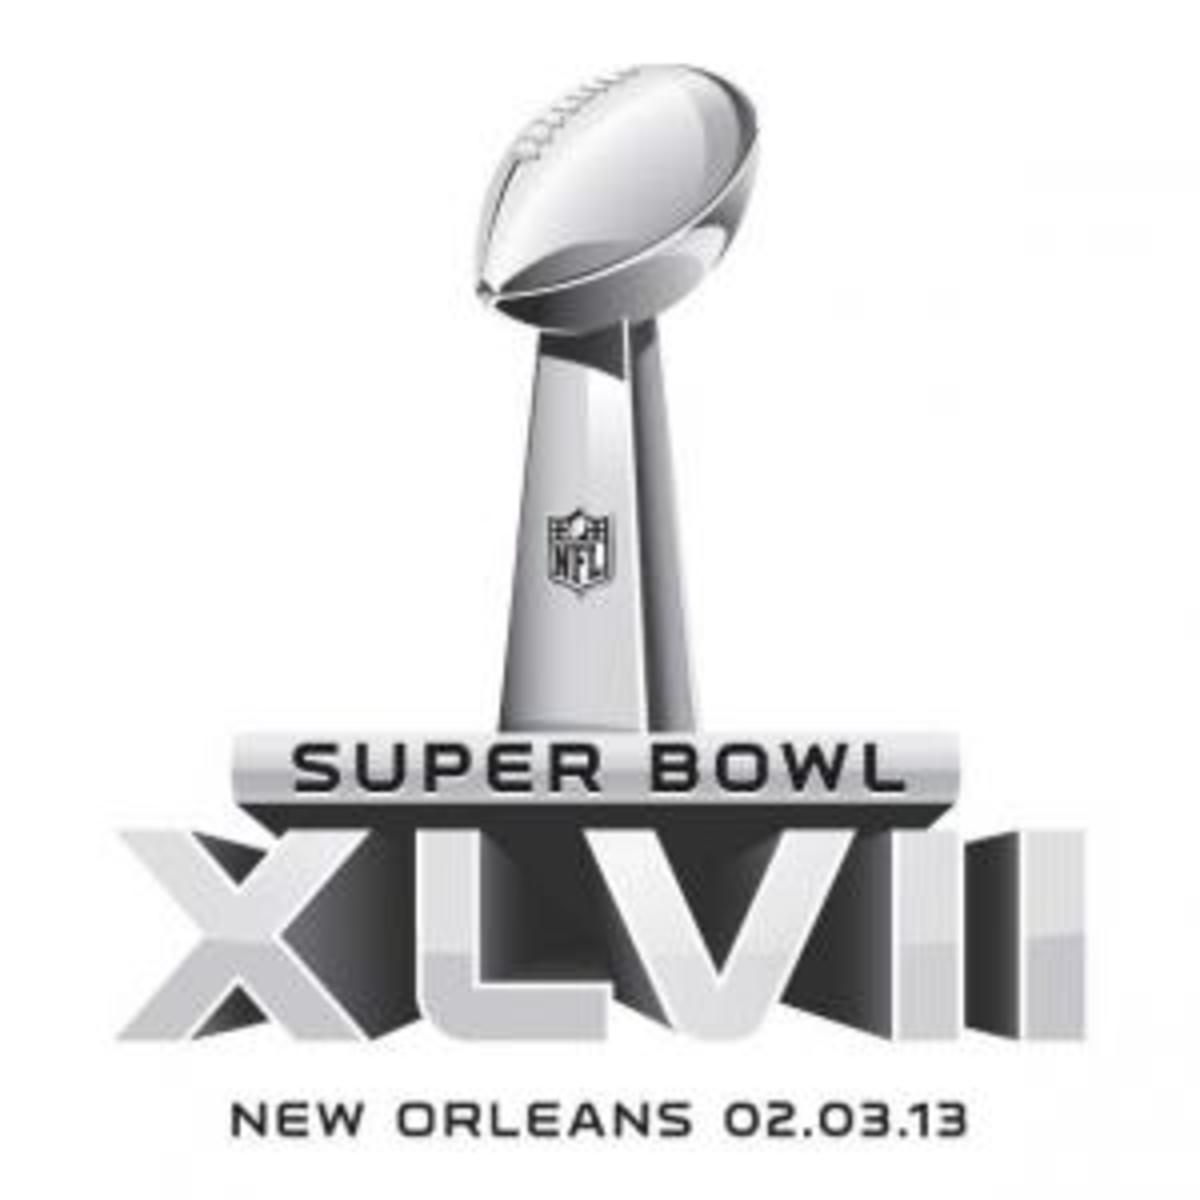 SuperBowl_XLVII_logo.jpeg